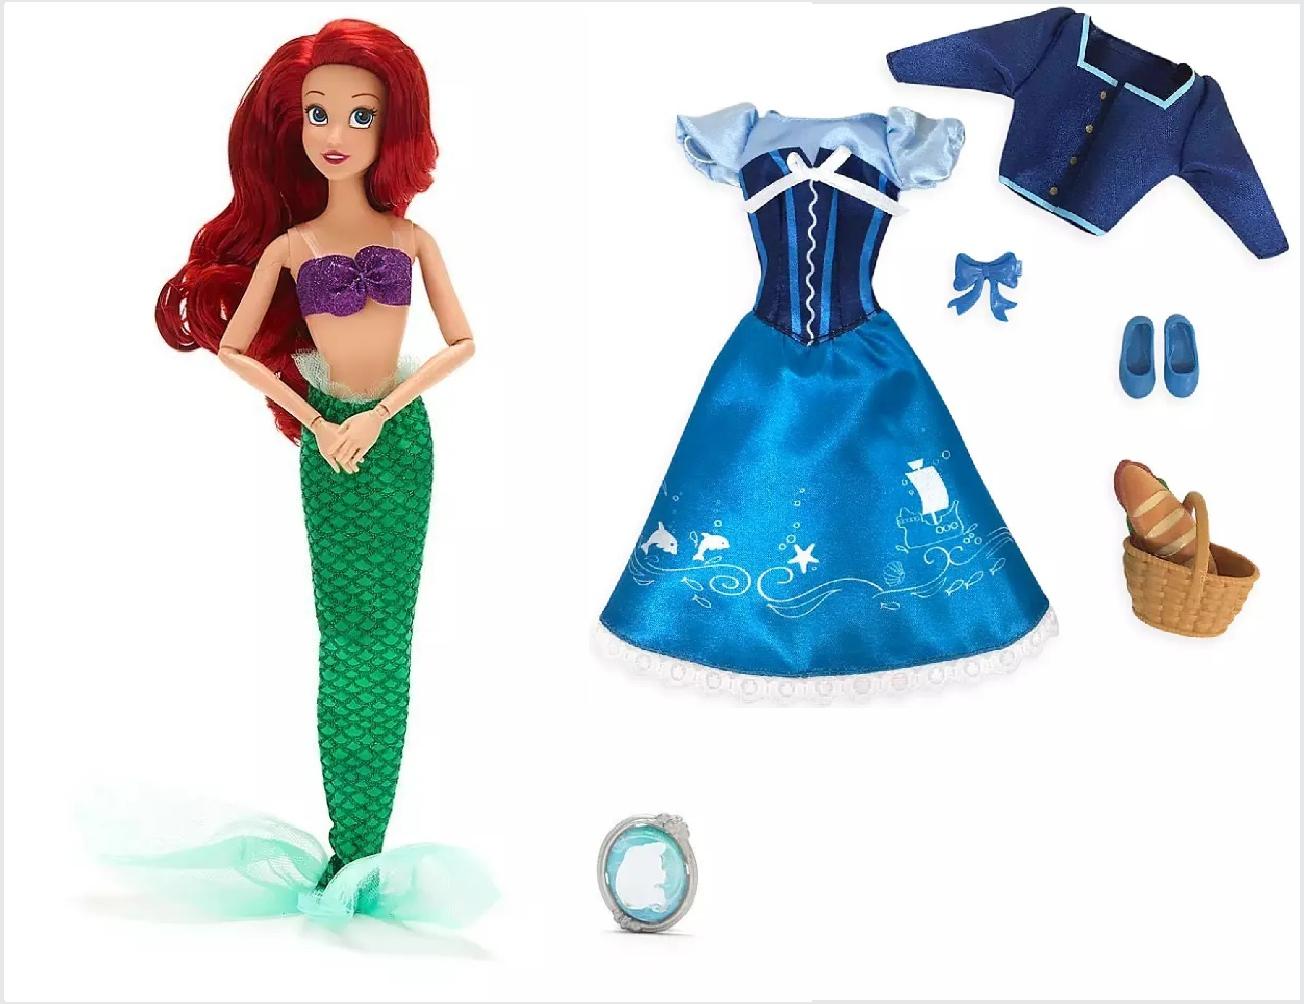 Conjunto de Boneca e Roupas da Princesa Ariel